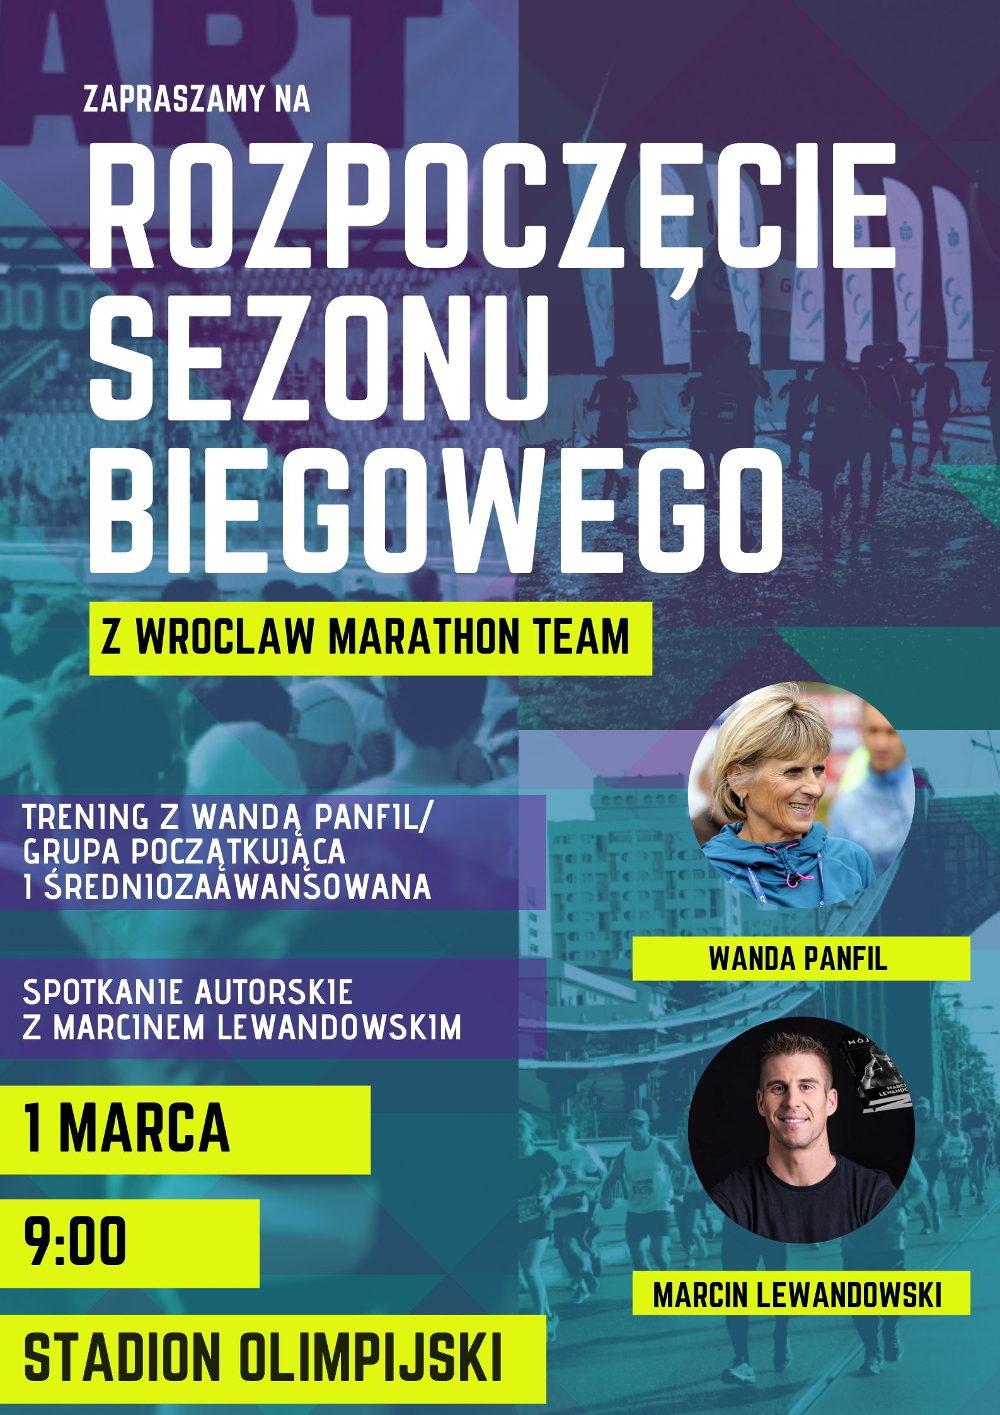 Wanda Panfil i Marcin Lewandowski we Wrocławiu